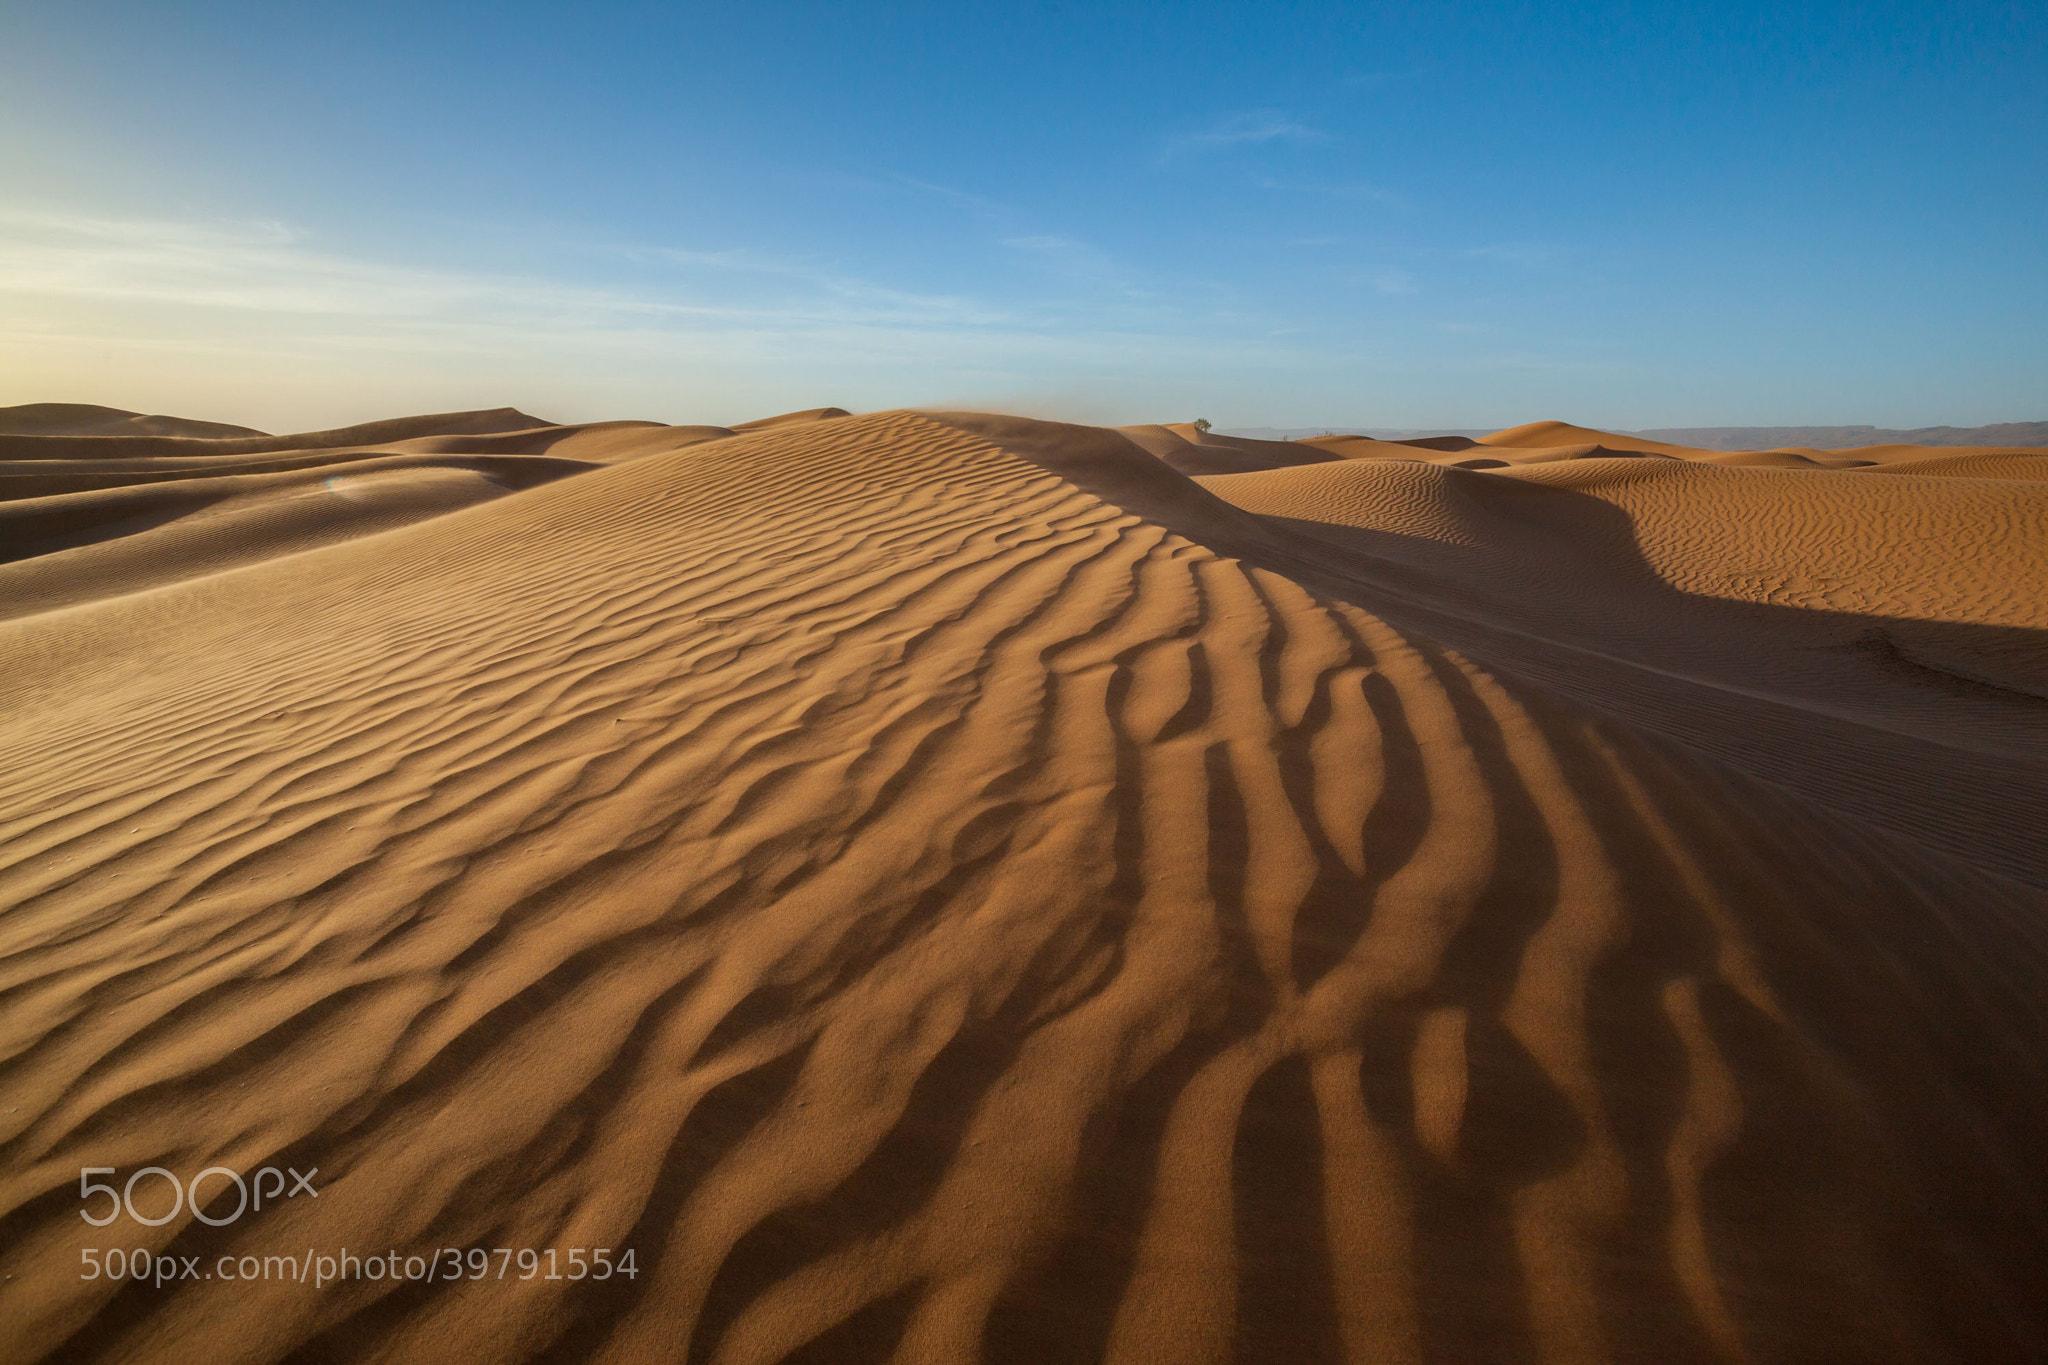 Photograph Desert by Emelianenko Dmitrii on 500px